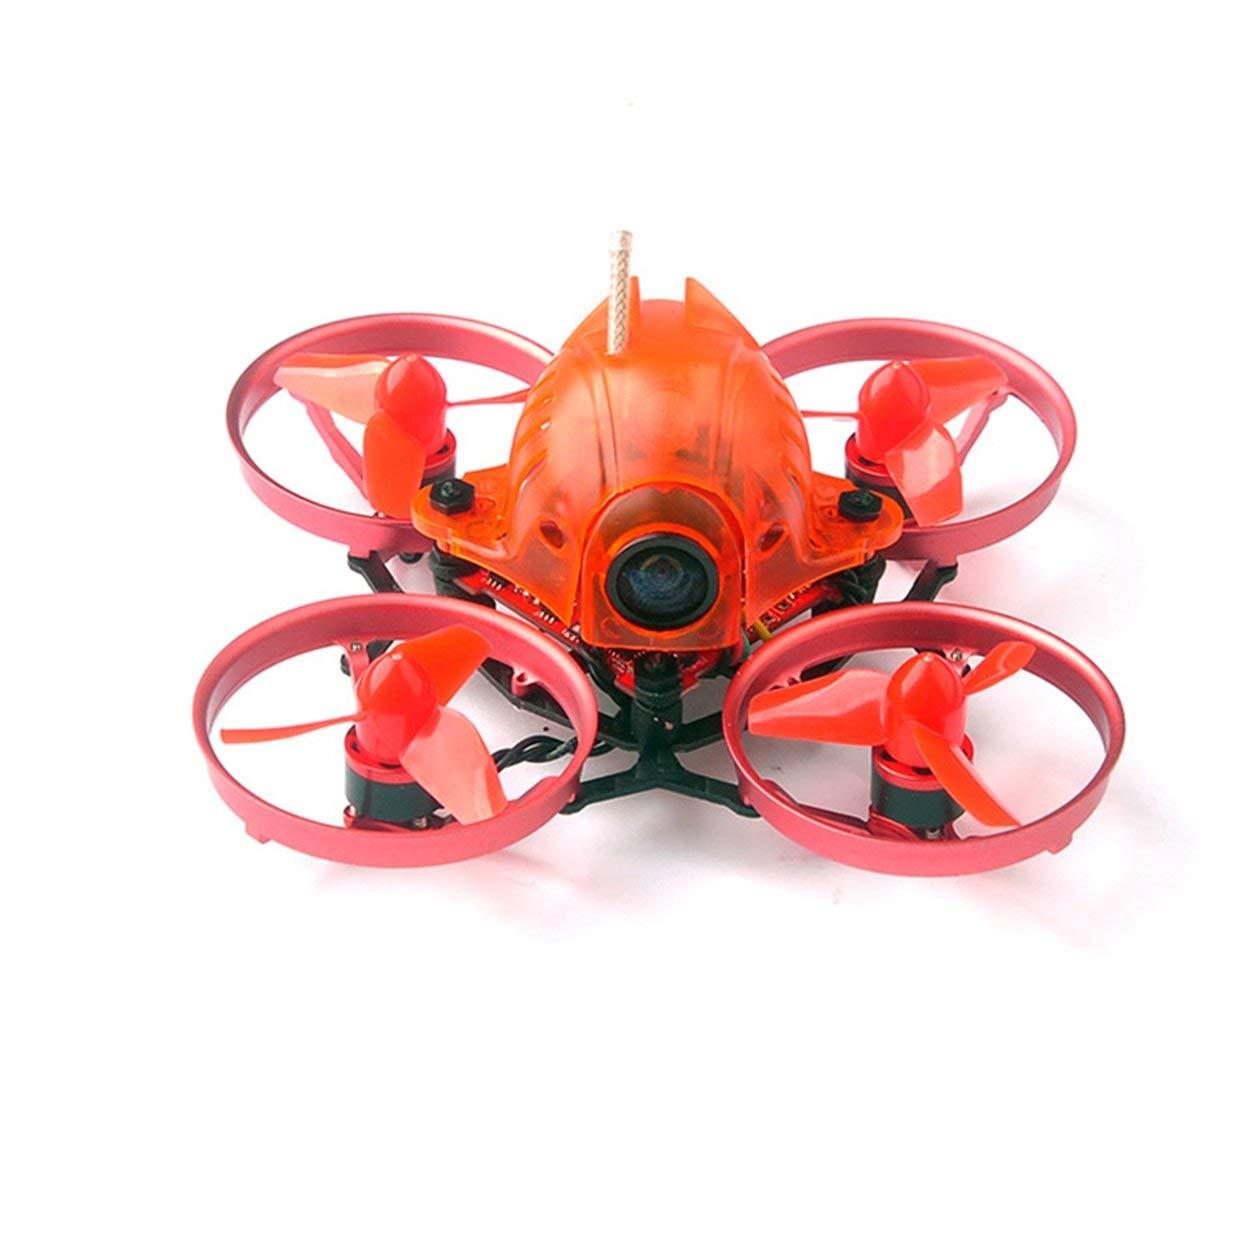 Lorenlli Passen Happymodel Snapper6 65mm 65mm Snapper6 Micro 1S Brushless FPV Racing RC Drone Quadcopter mit F3 OSD BLHeli_S 5A ESC BNF Version cb66ce